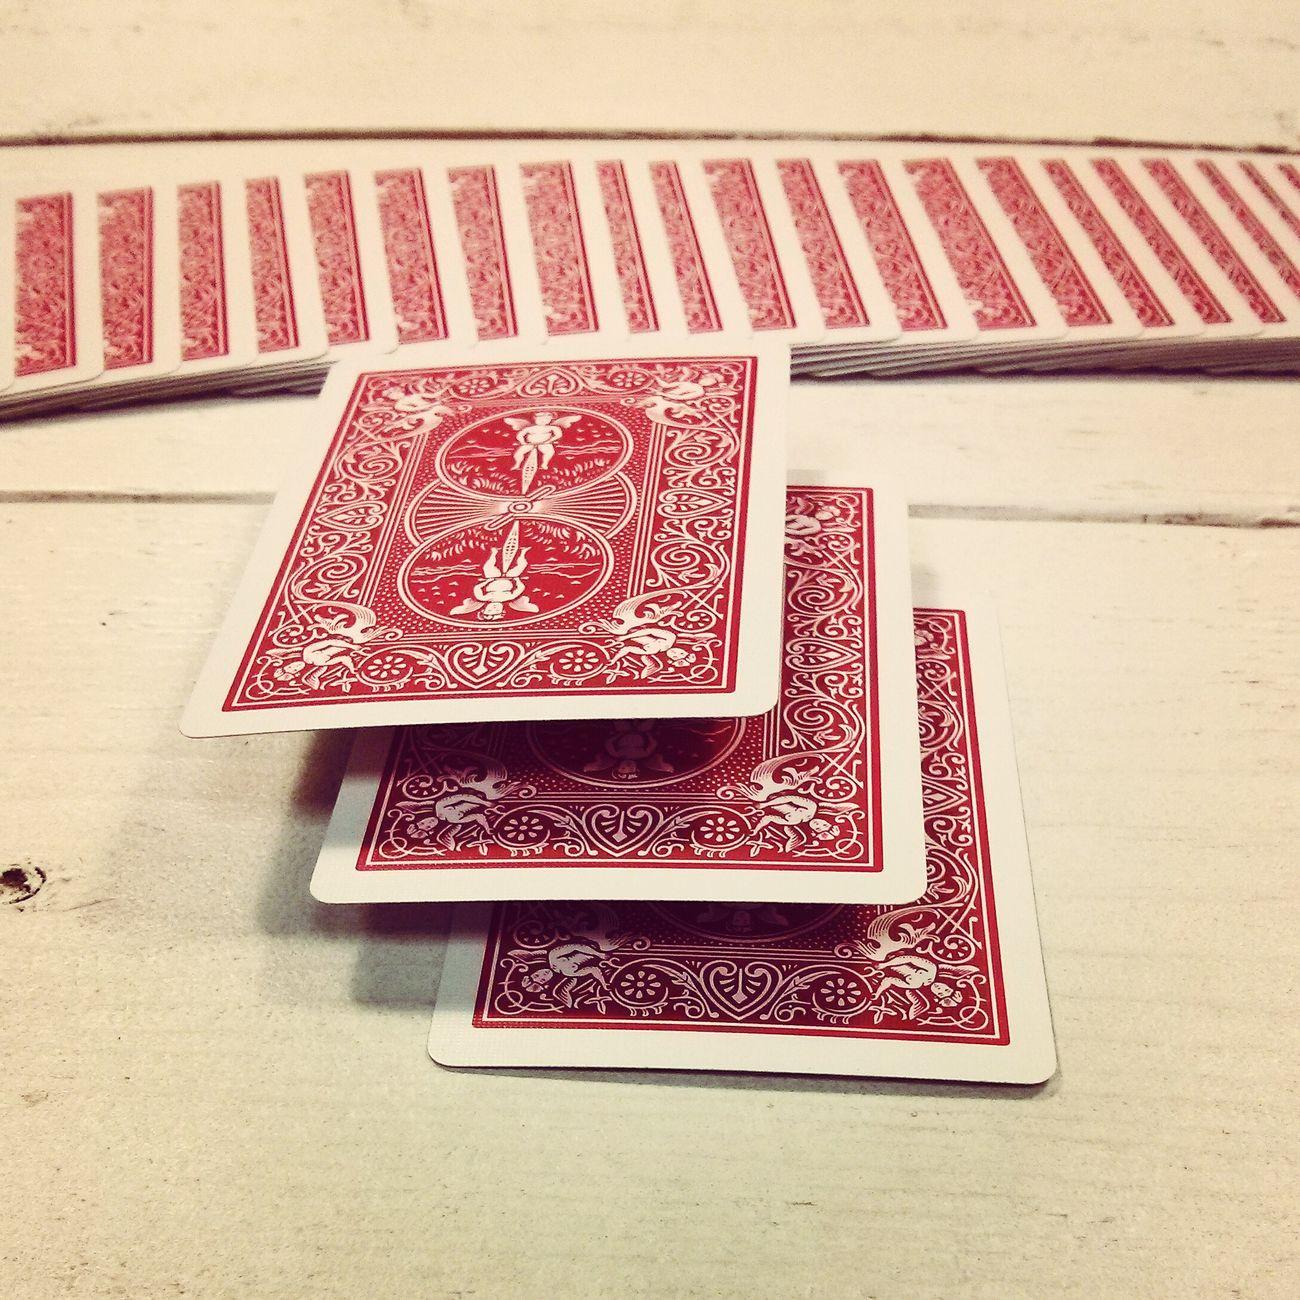 Levitation Floating Magic Poker Playingcardart Playing Cards